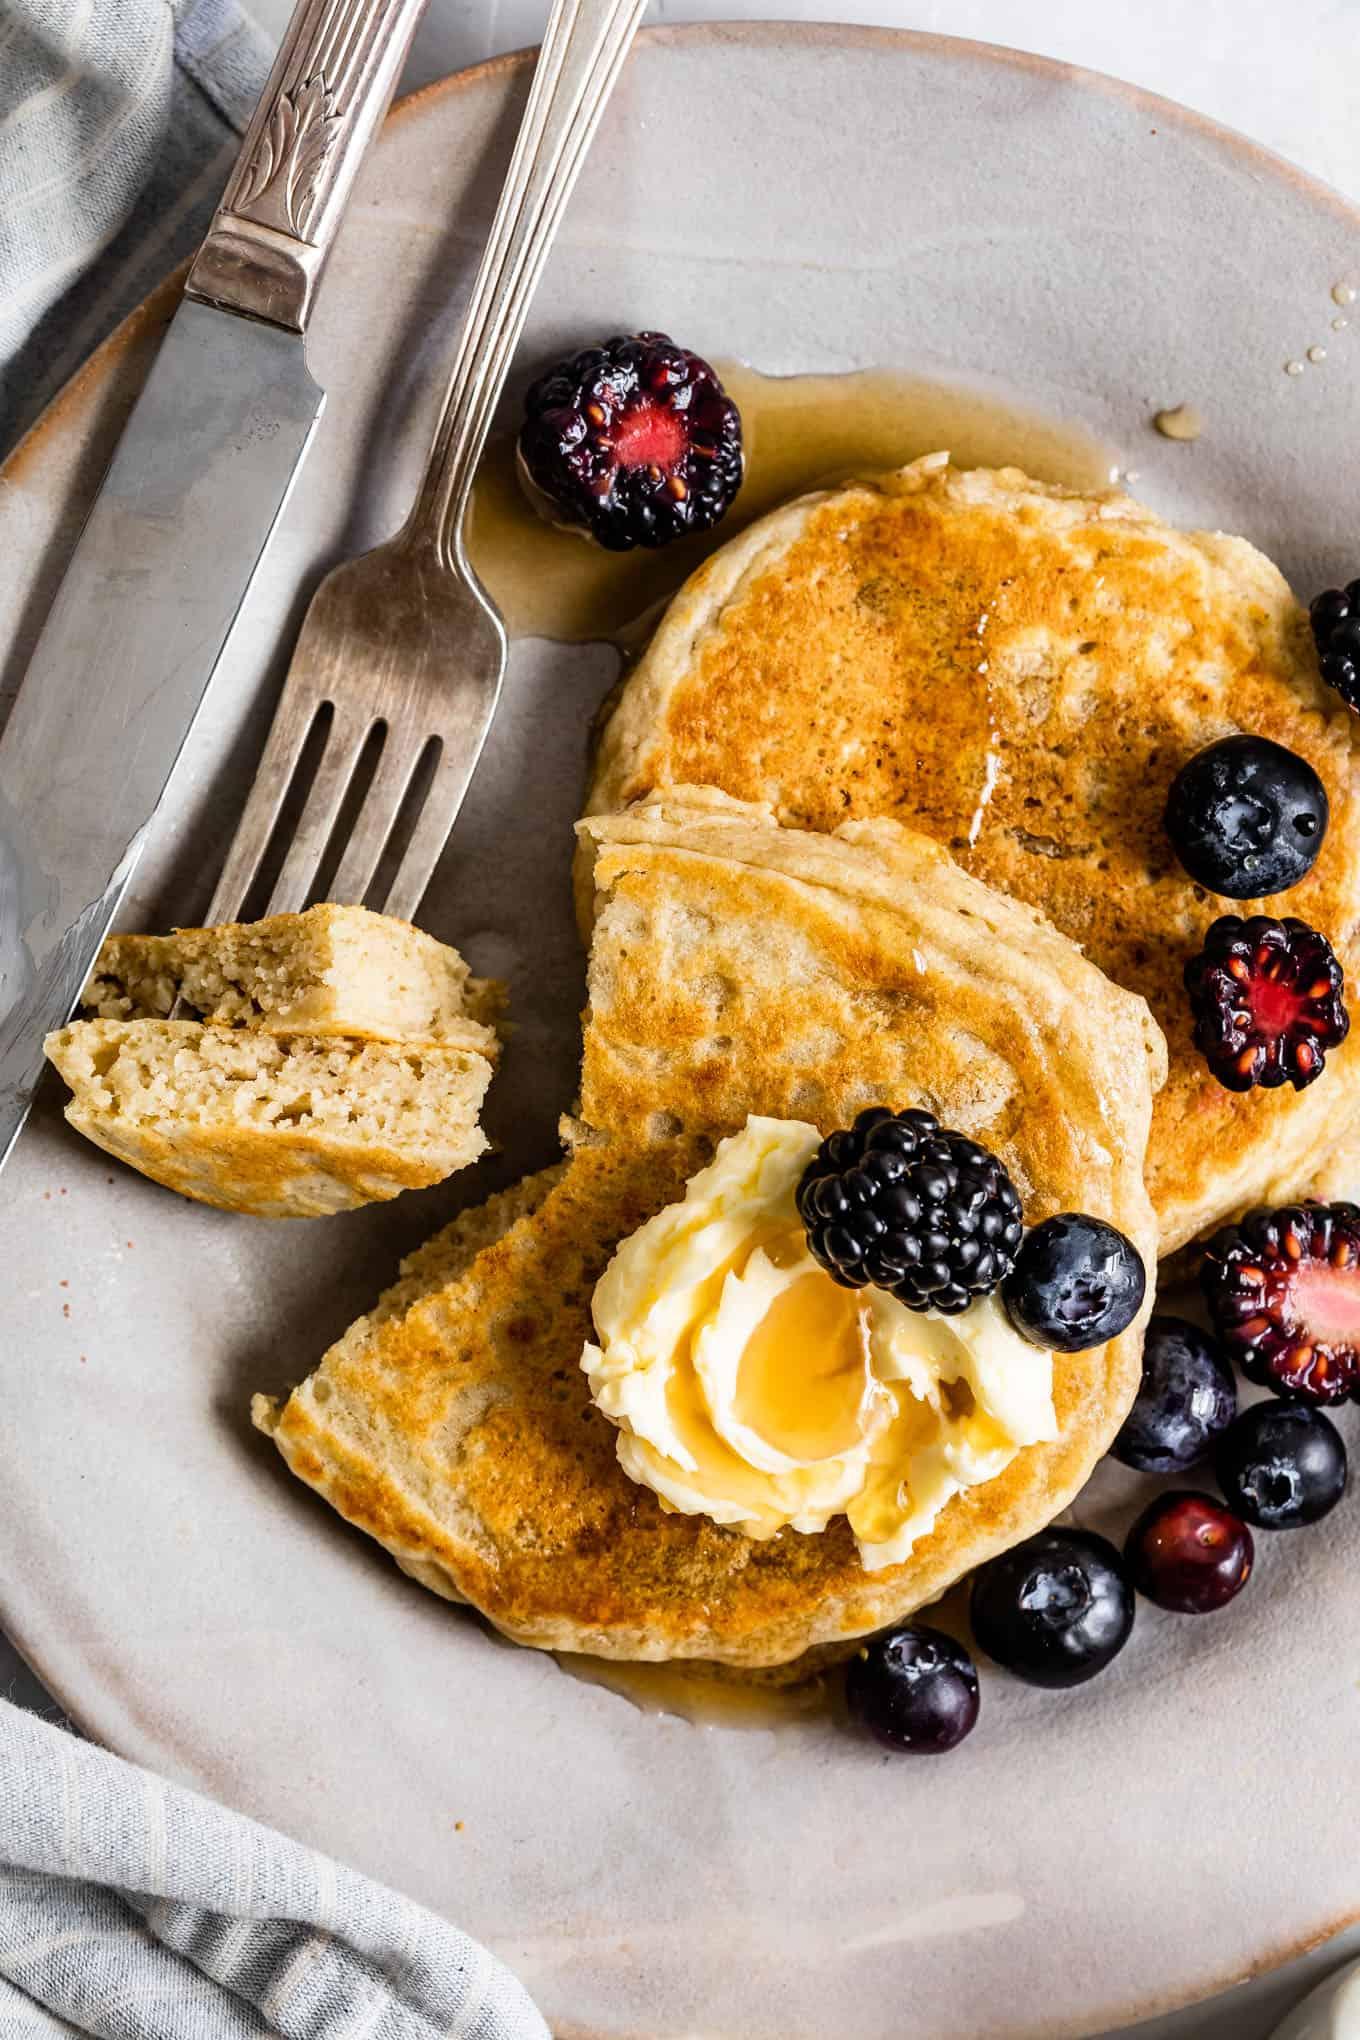 Inside of homemade gluten-free pancakes